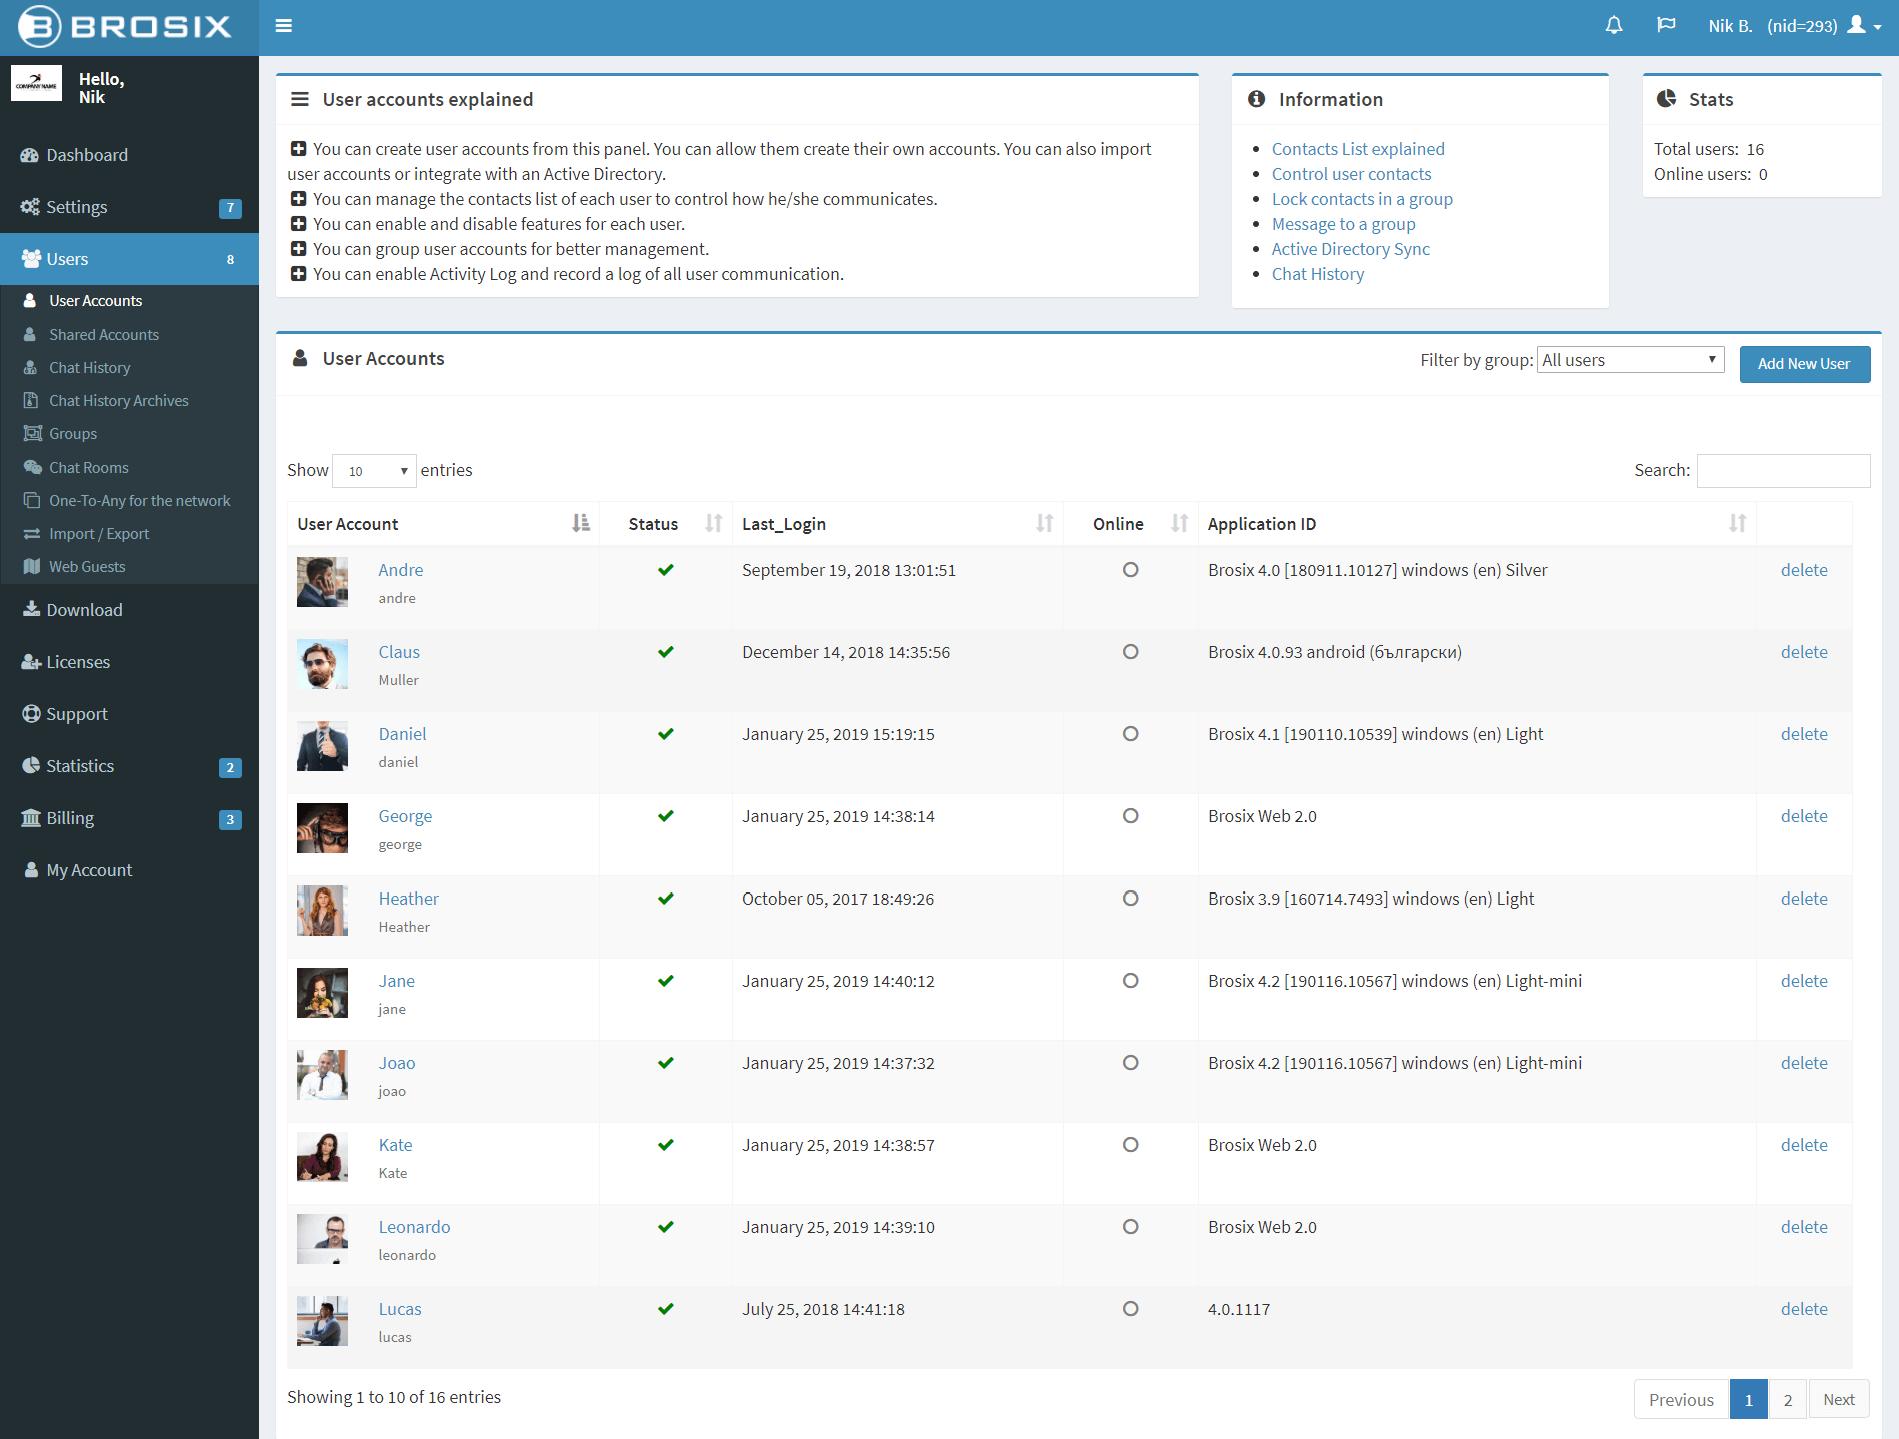 Manage User Accounts - Brosix